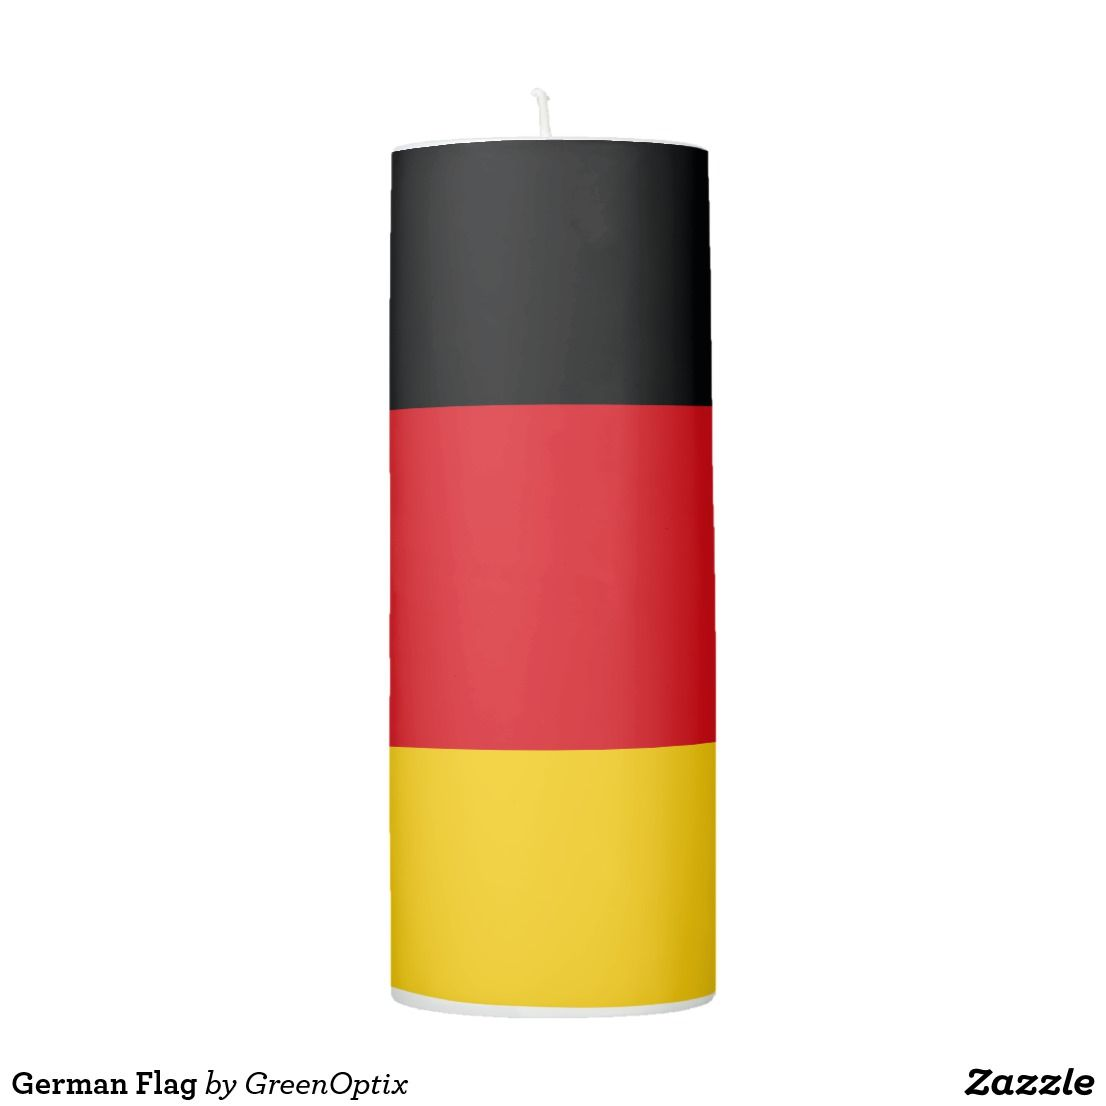 German Flag Pillar Candle Zazzle Com Custom Candles Pillar Candles Burning Candle